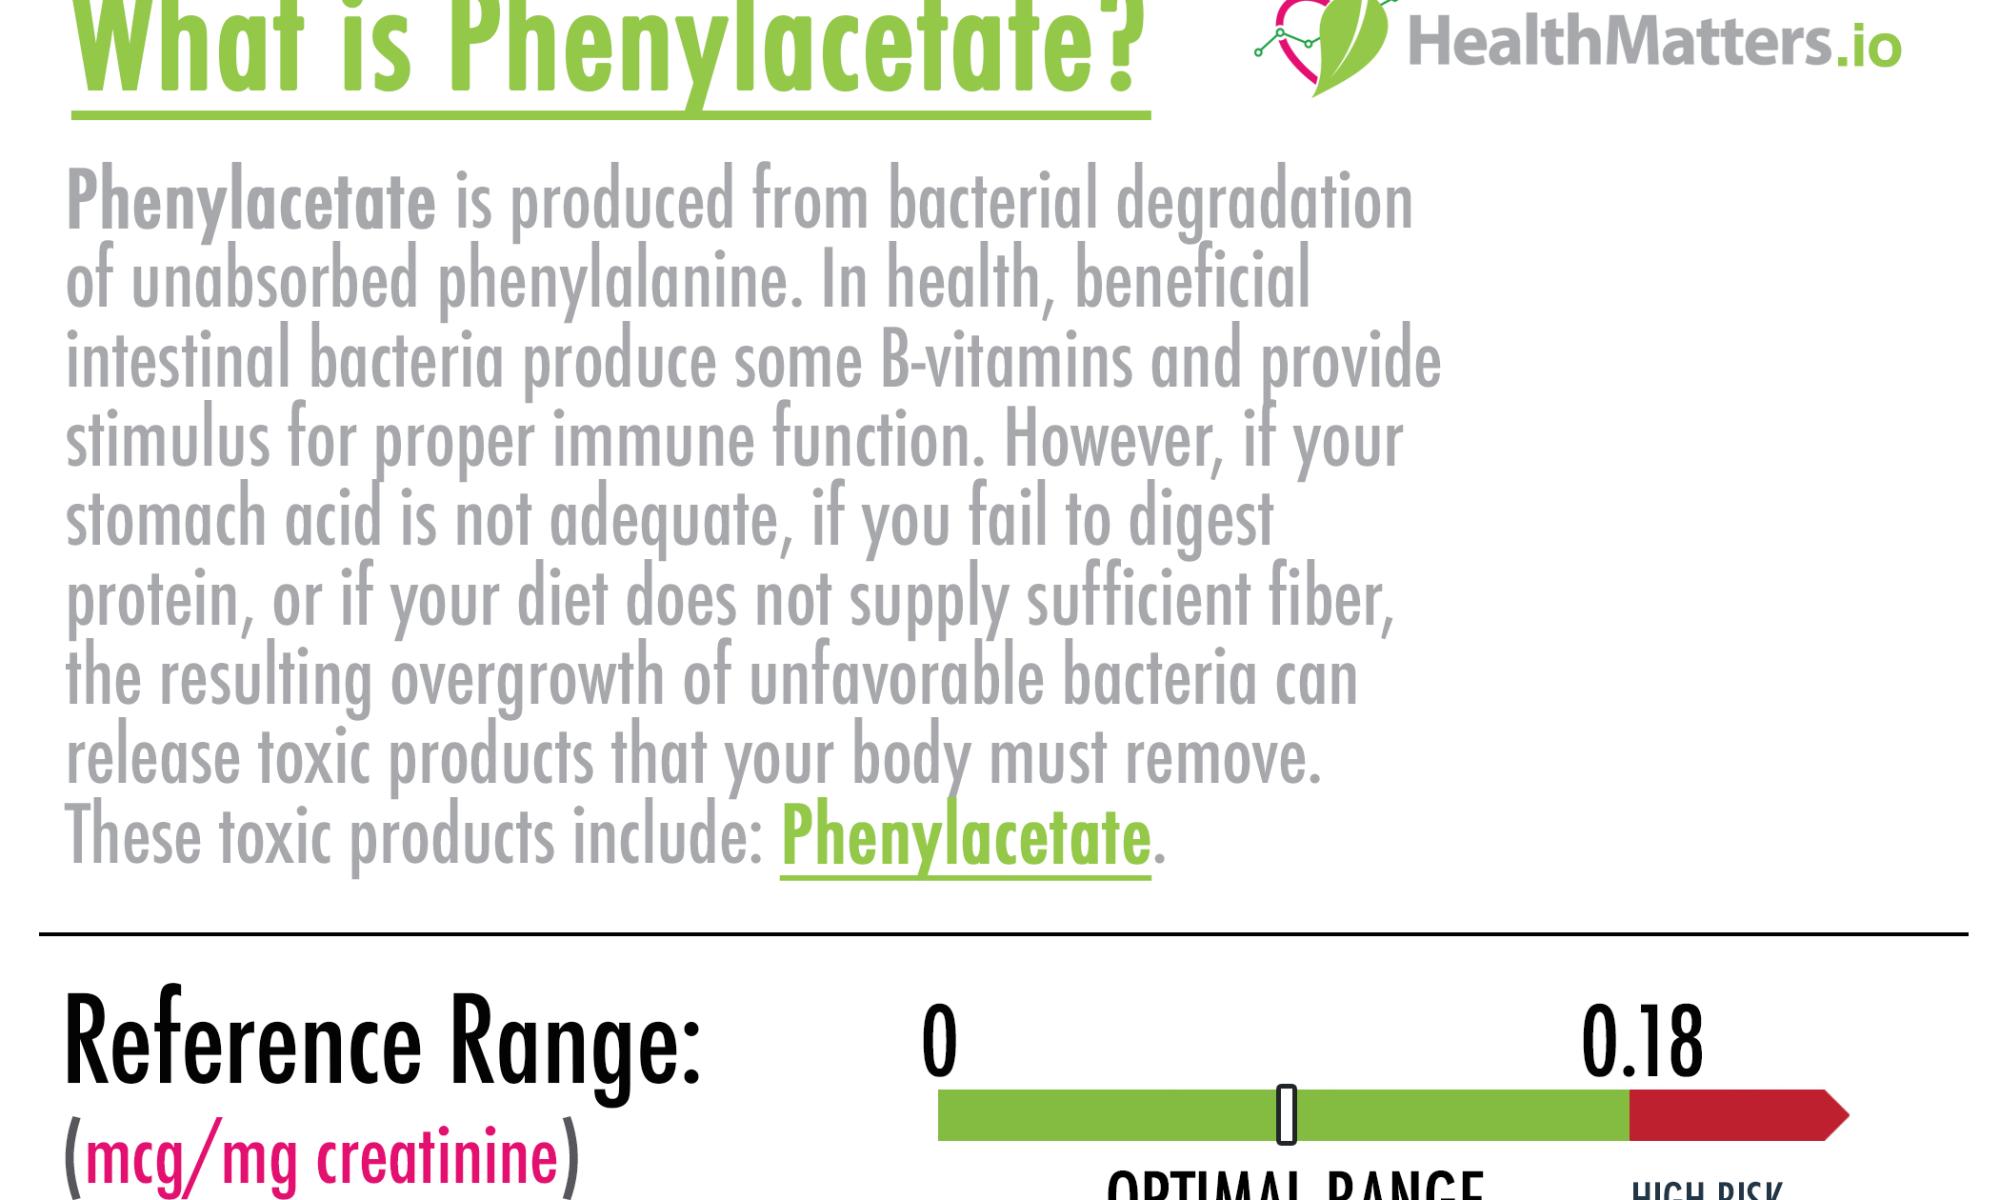 Phenylacetate high low test genova bacteria treatment reference ranges optimal